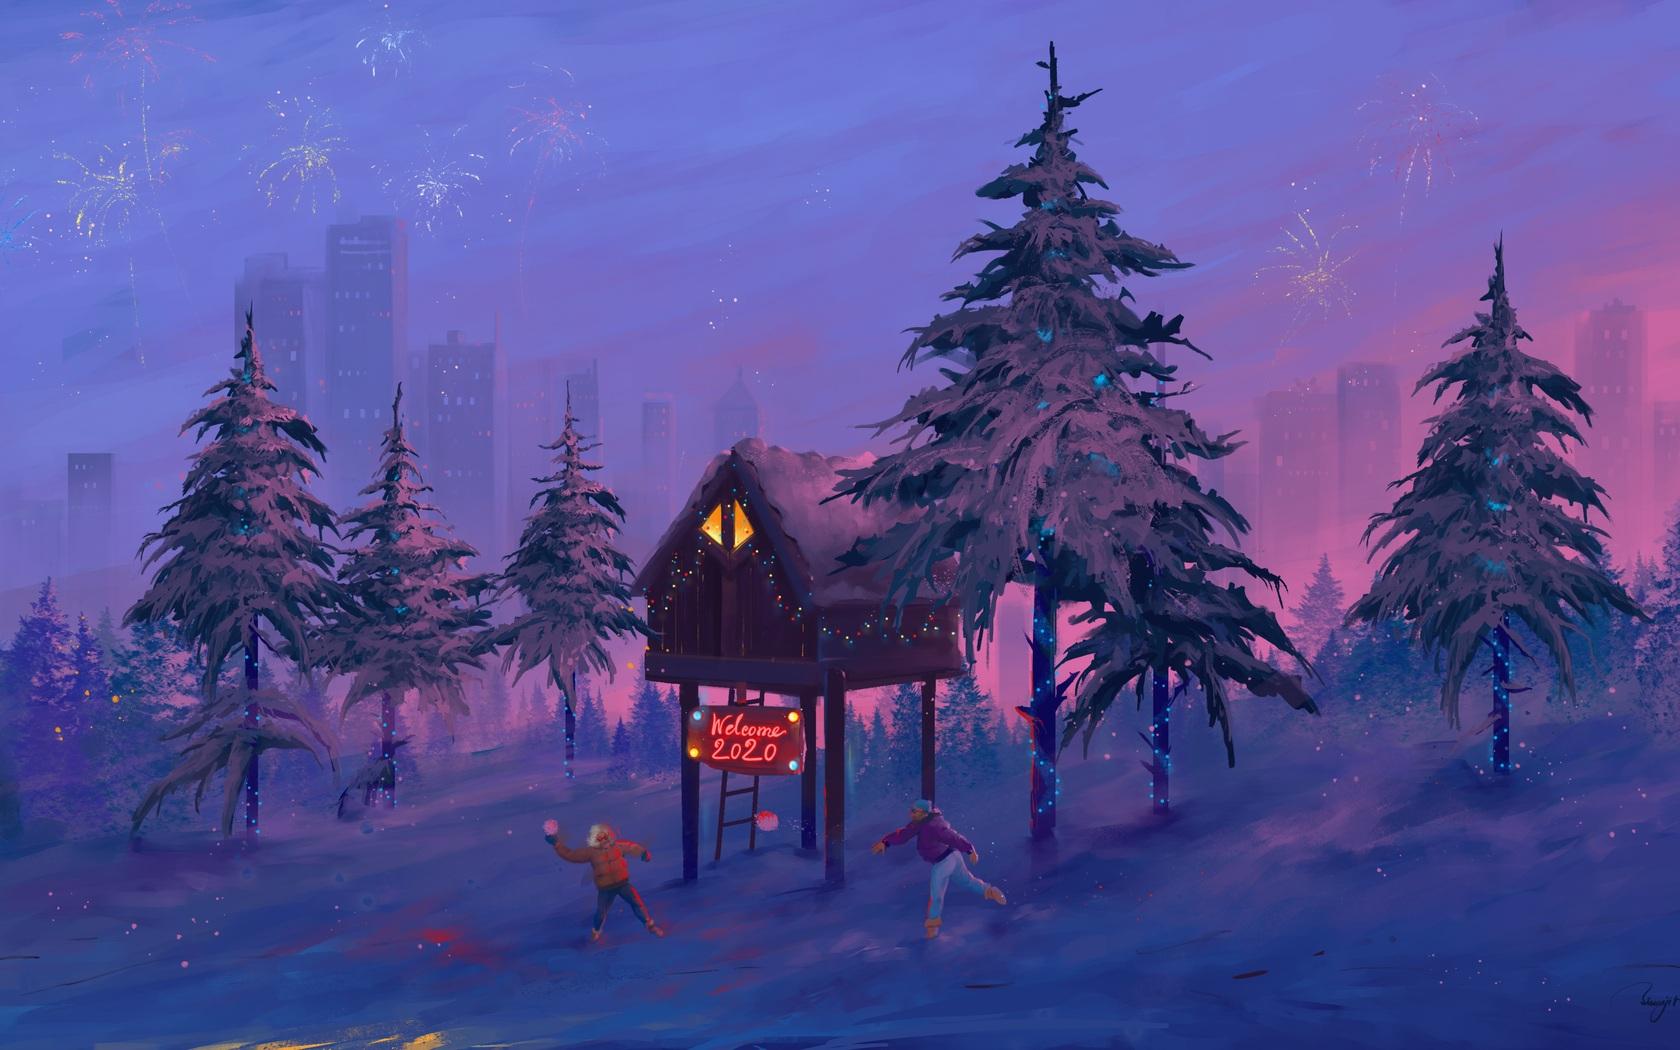 welcome-new-year-2020-snow-5k-ue.jpg